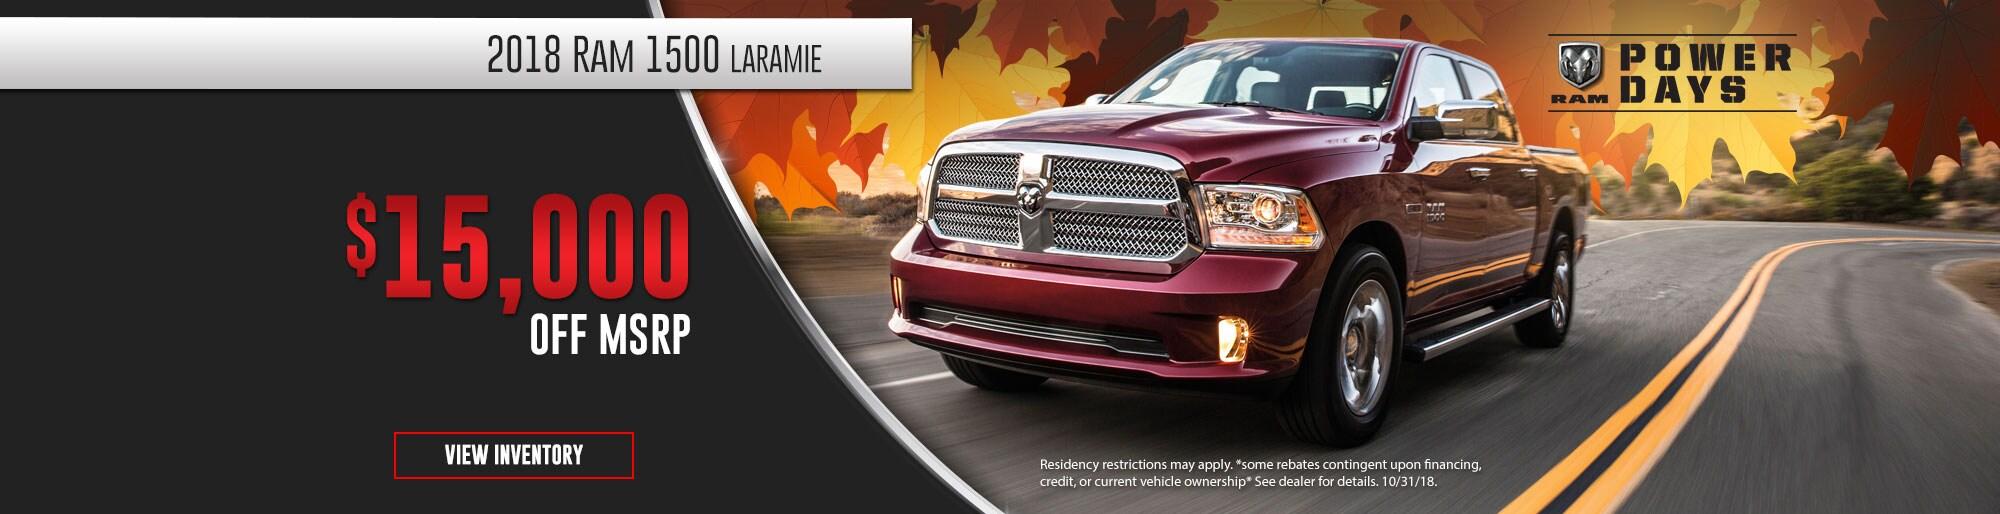 Exceptional Hugh White Family Of Dealerships | New Dodge, Jeep, Buick, Chevrolet,  Chrysler, Honda, Nissan, Ram Dealership In Lancaster, OH 43130